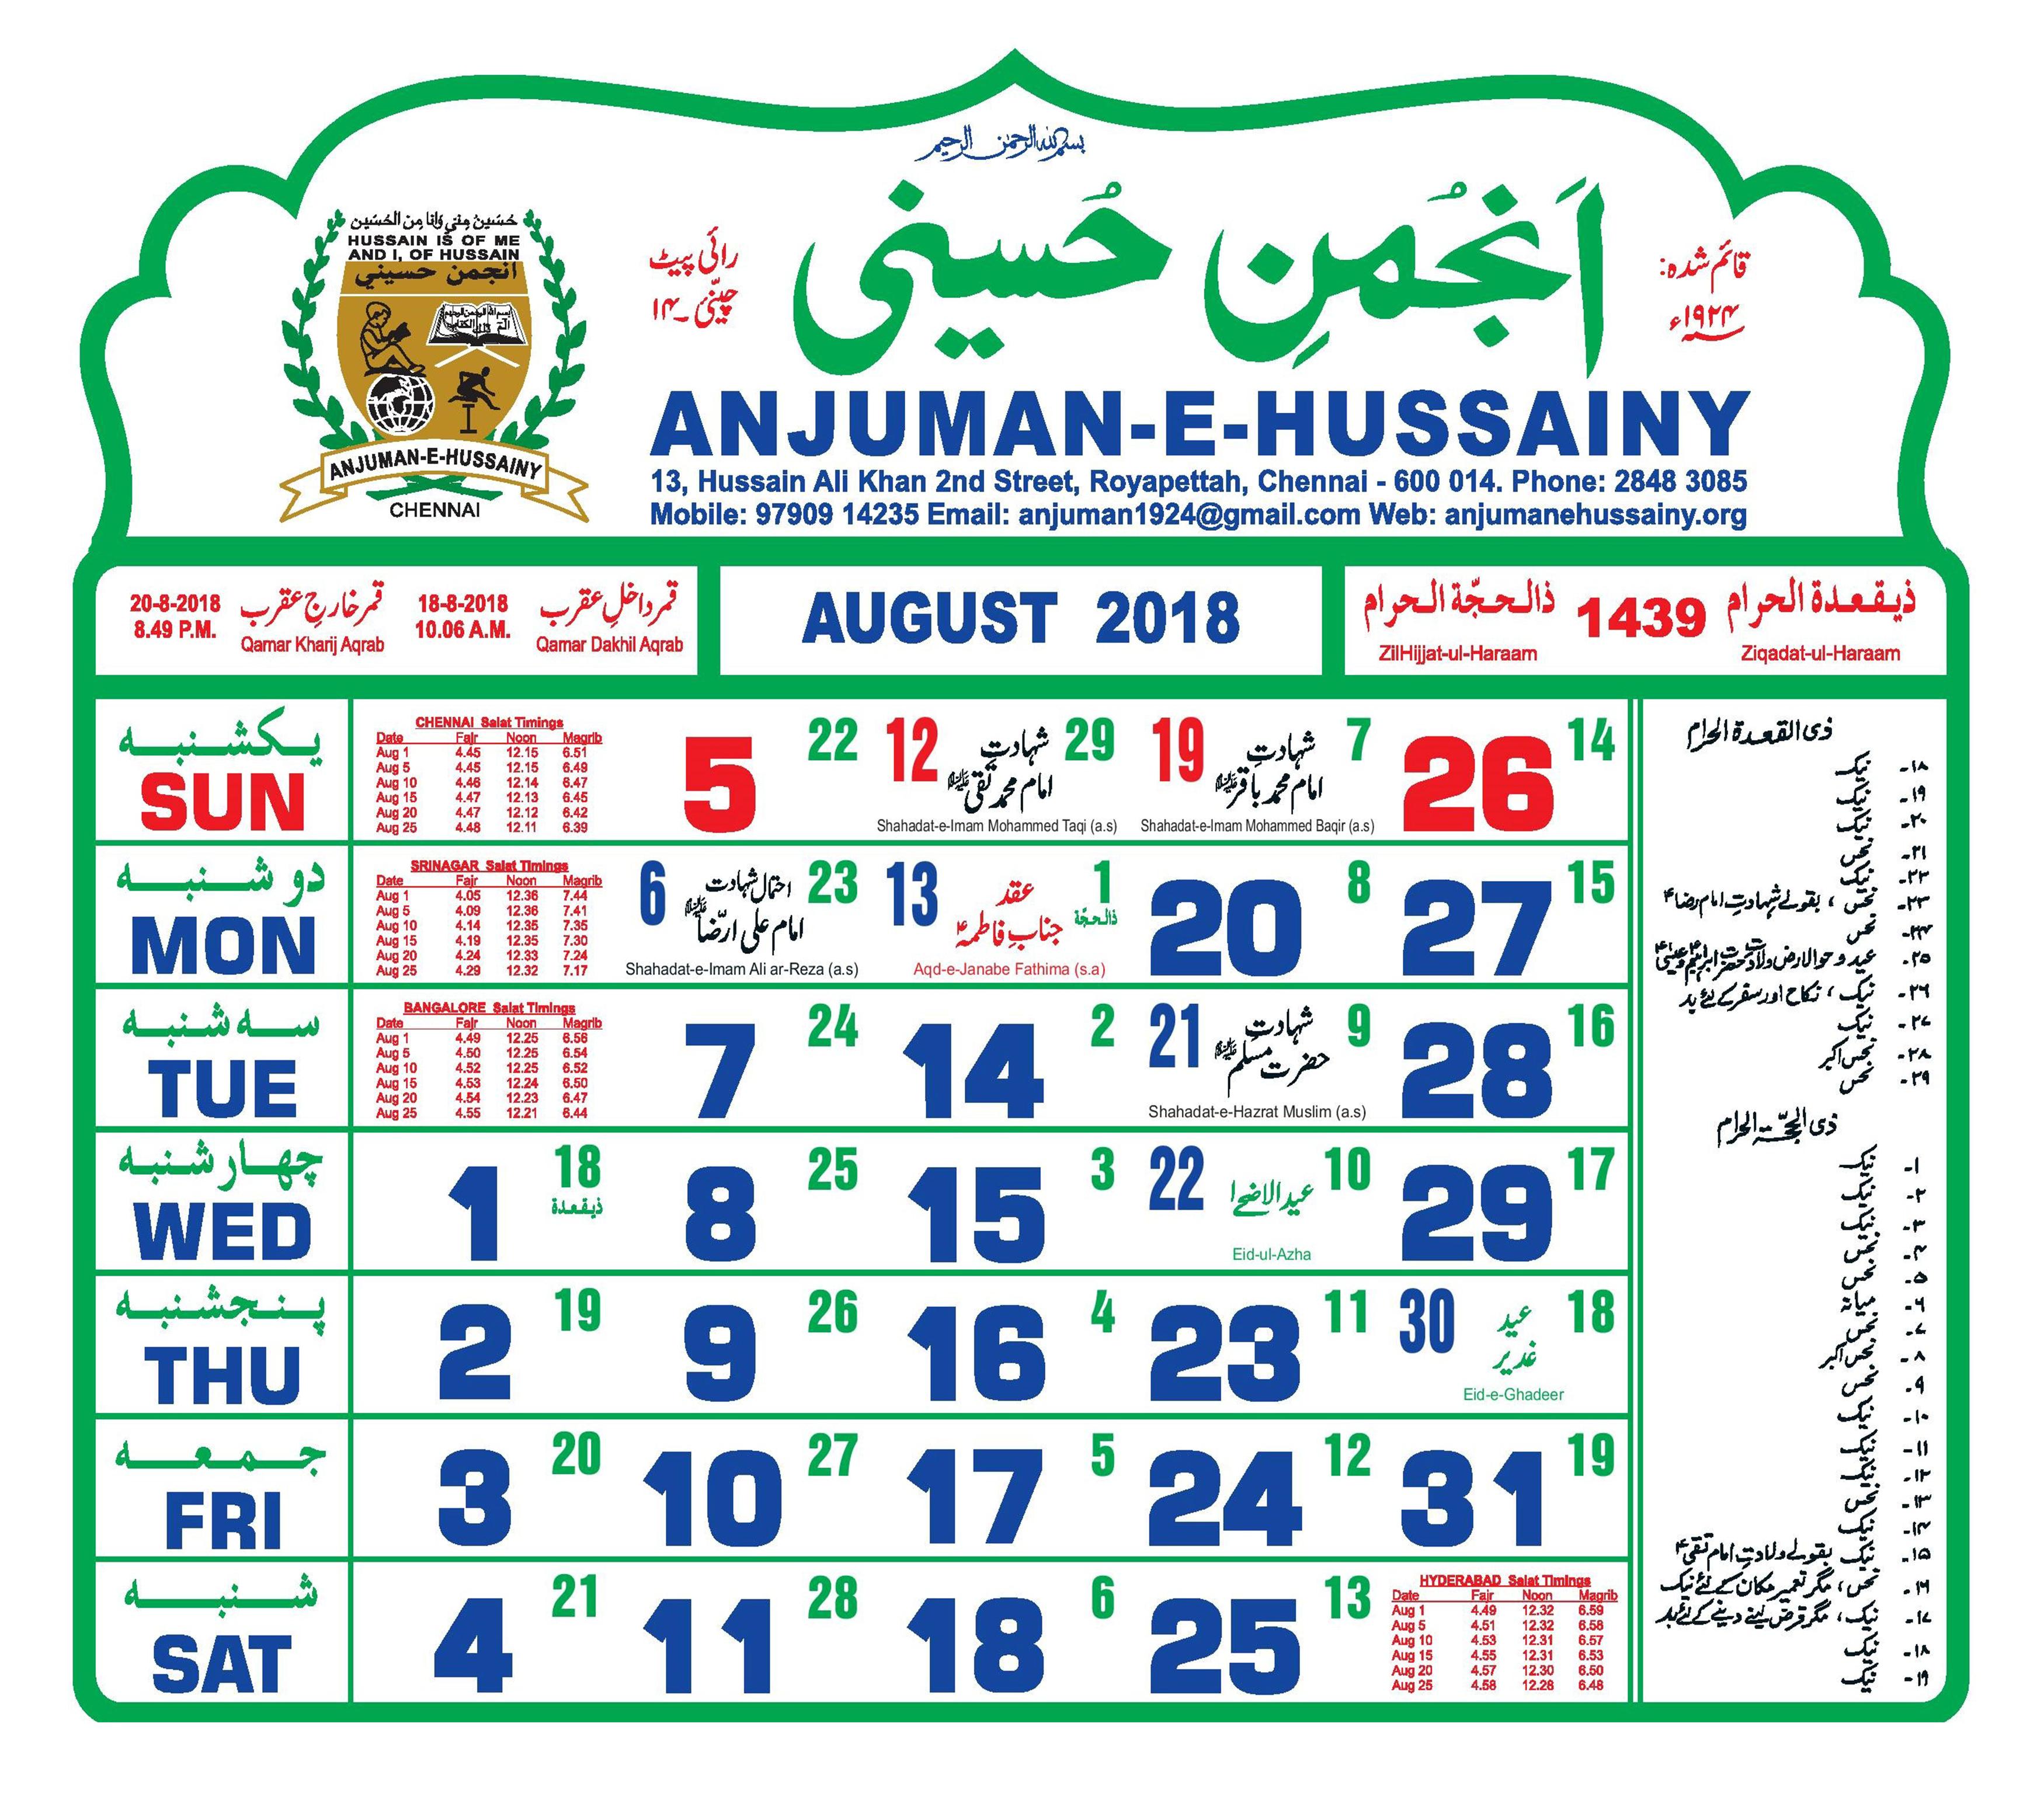 Yaad E Hussain — Ya Imam Hussain - Yaad E Hussain regarding Hussaini Calendar 2018